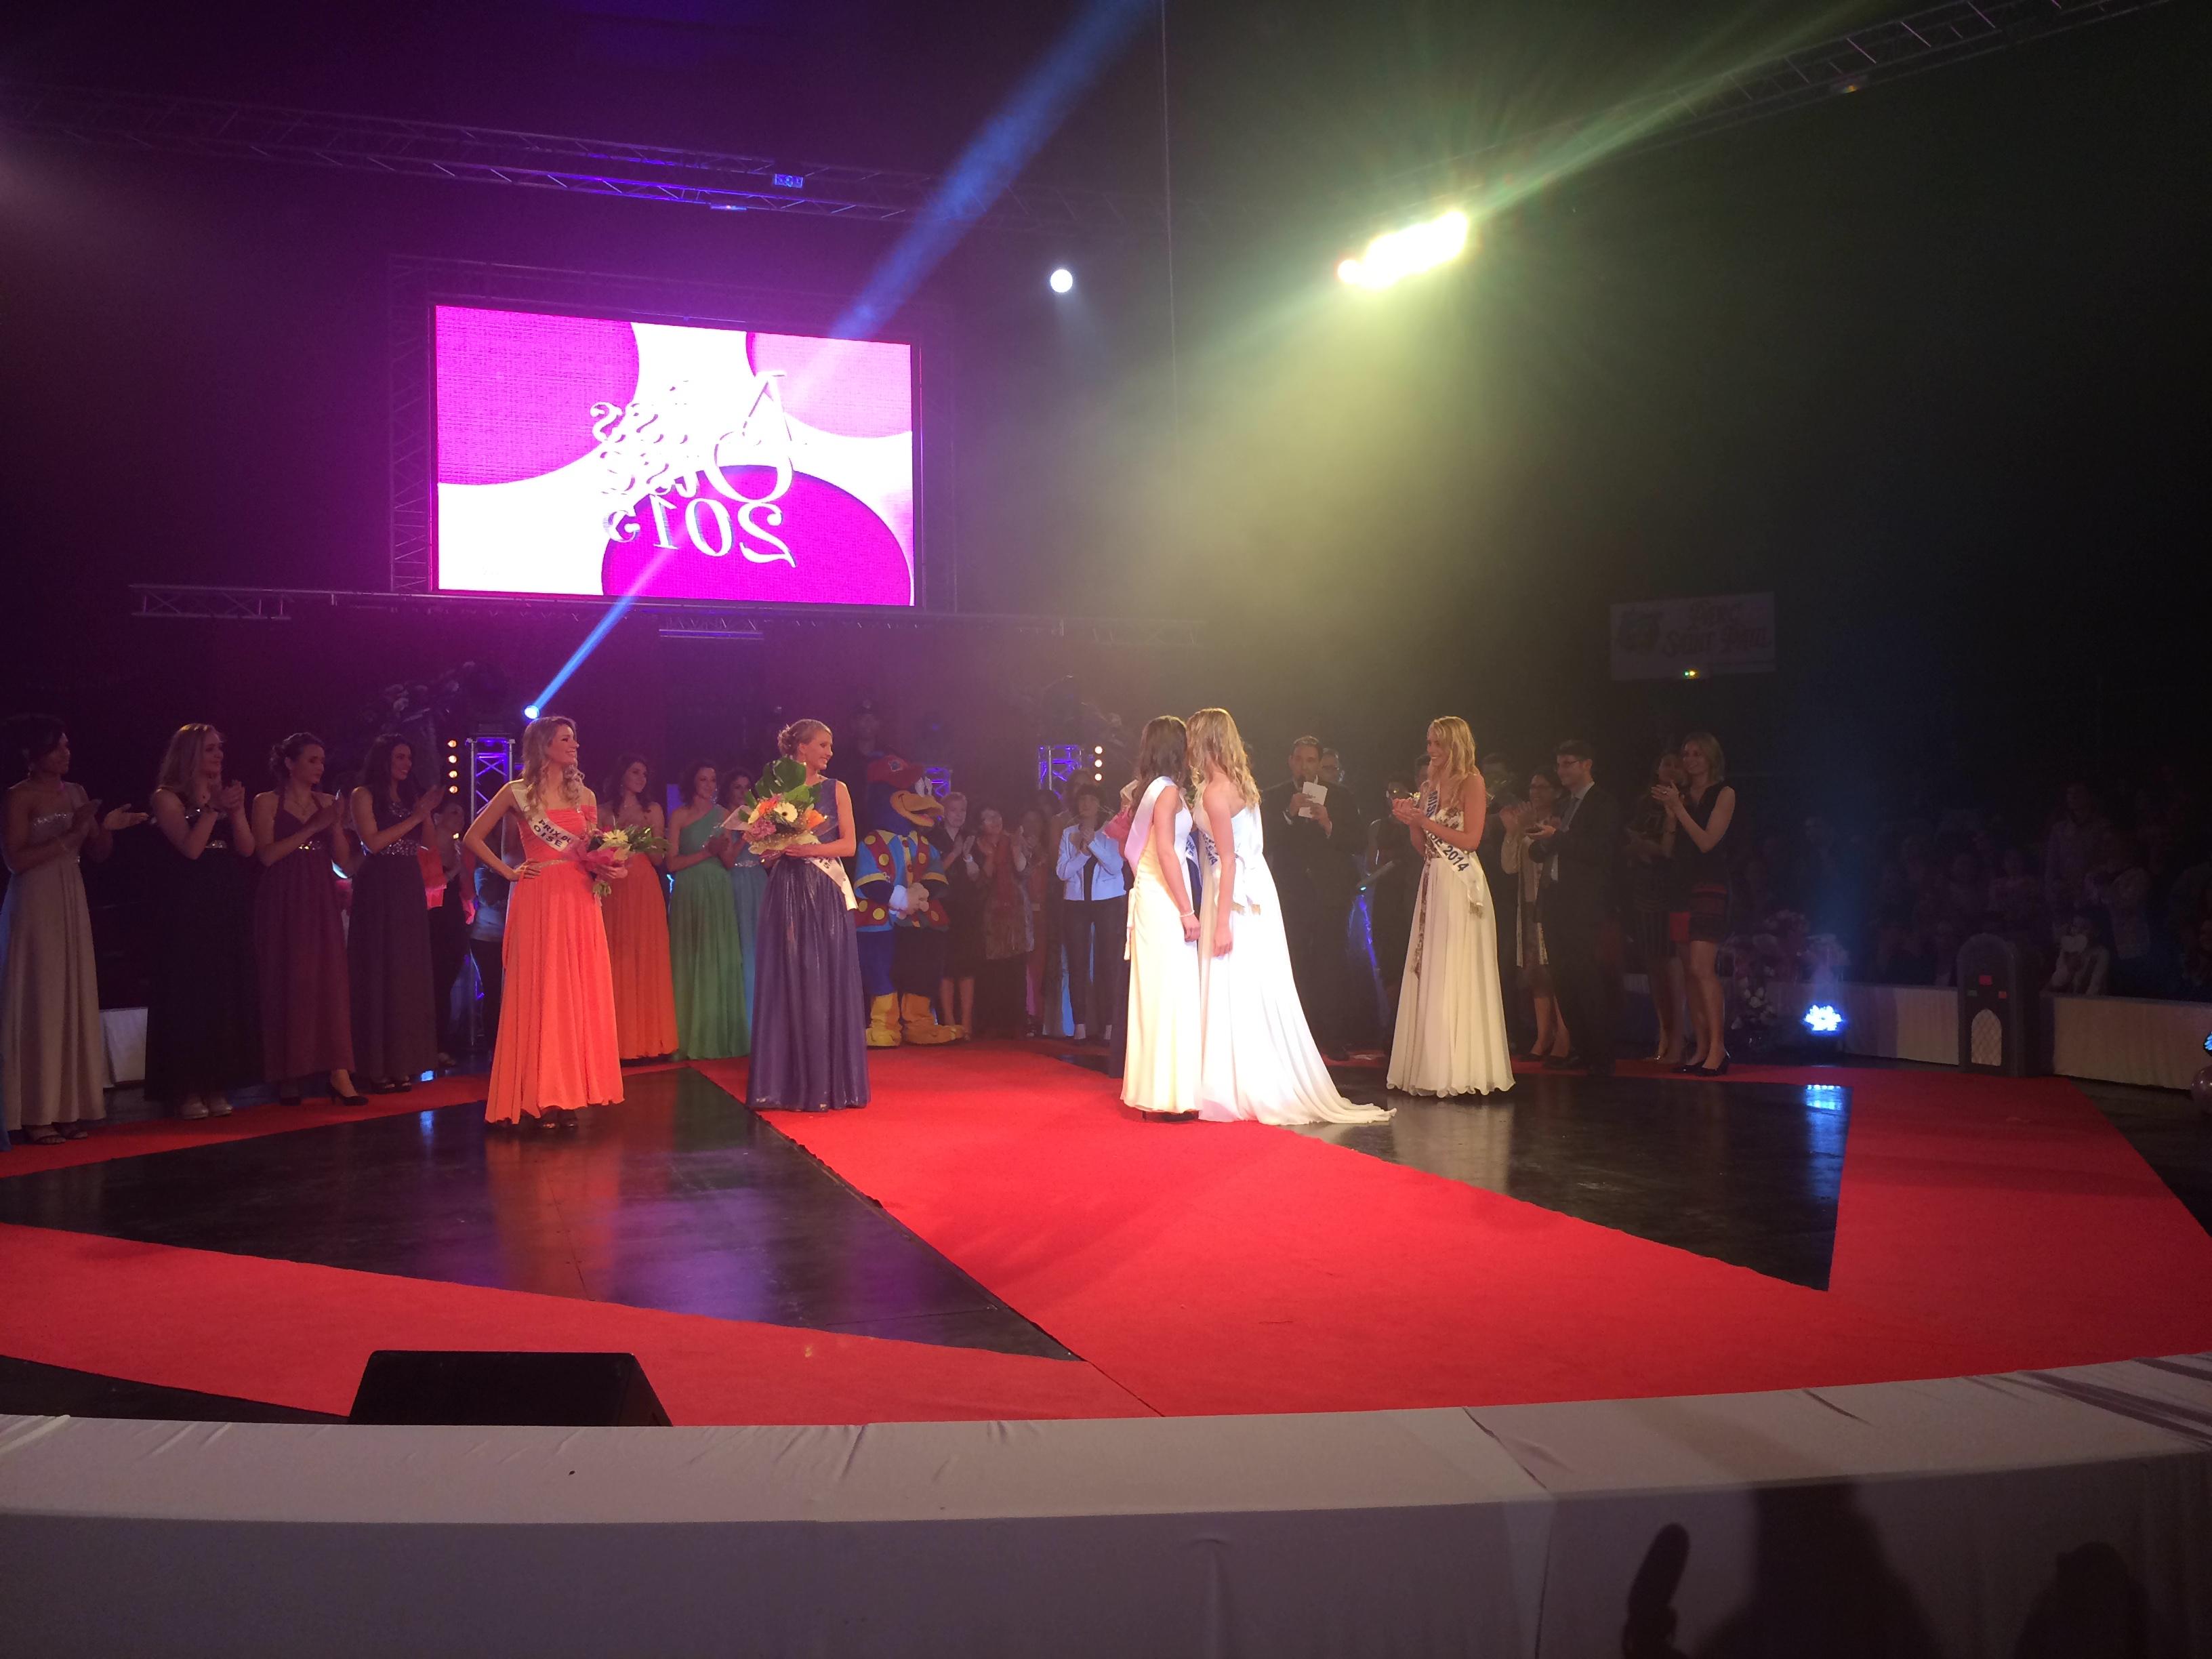 Miss oise amandine anneet expo 60 foire exposition for Amiens foire expo